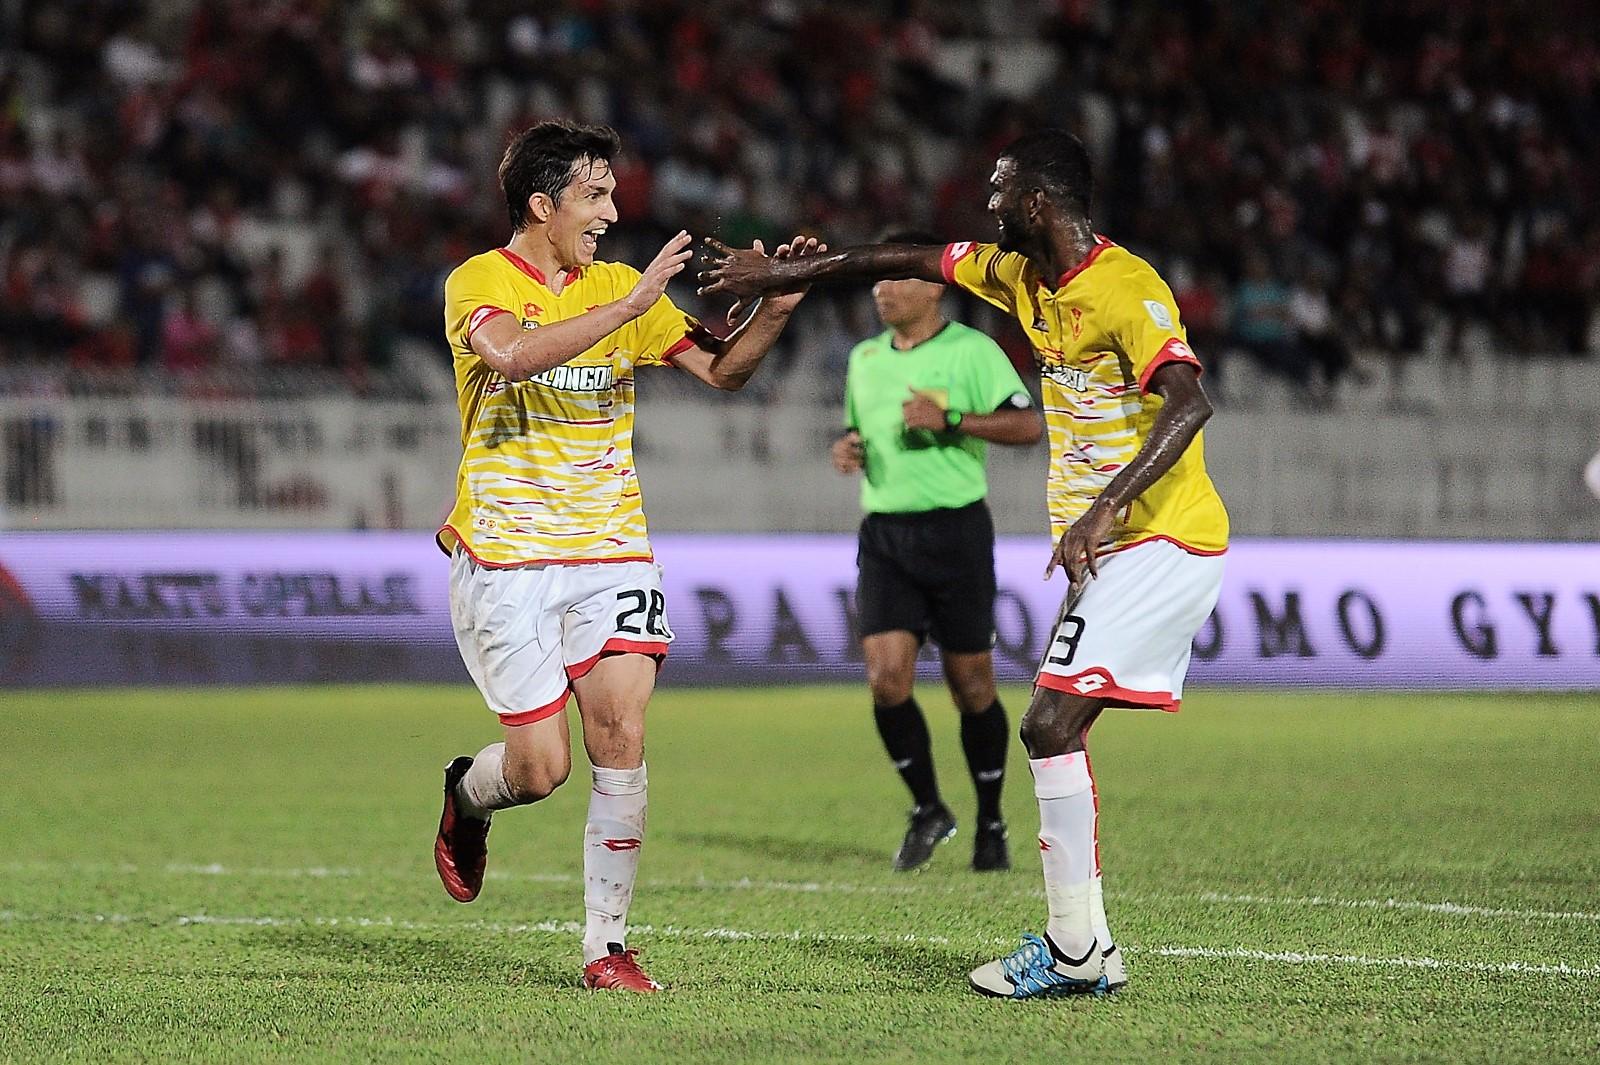 Selangors-juliano-mineiro-left-celebrates-his-goal-against-kelantan-with-s-veenod-2522017_2dfcp5yb9udj1coherafsc5po